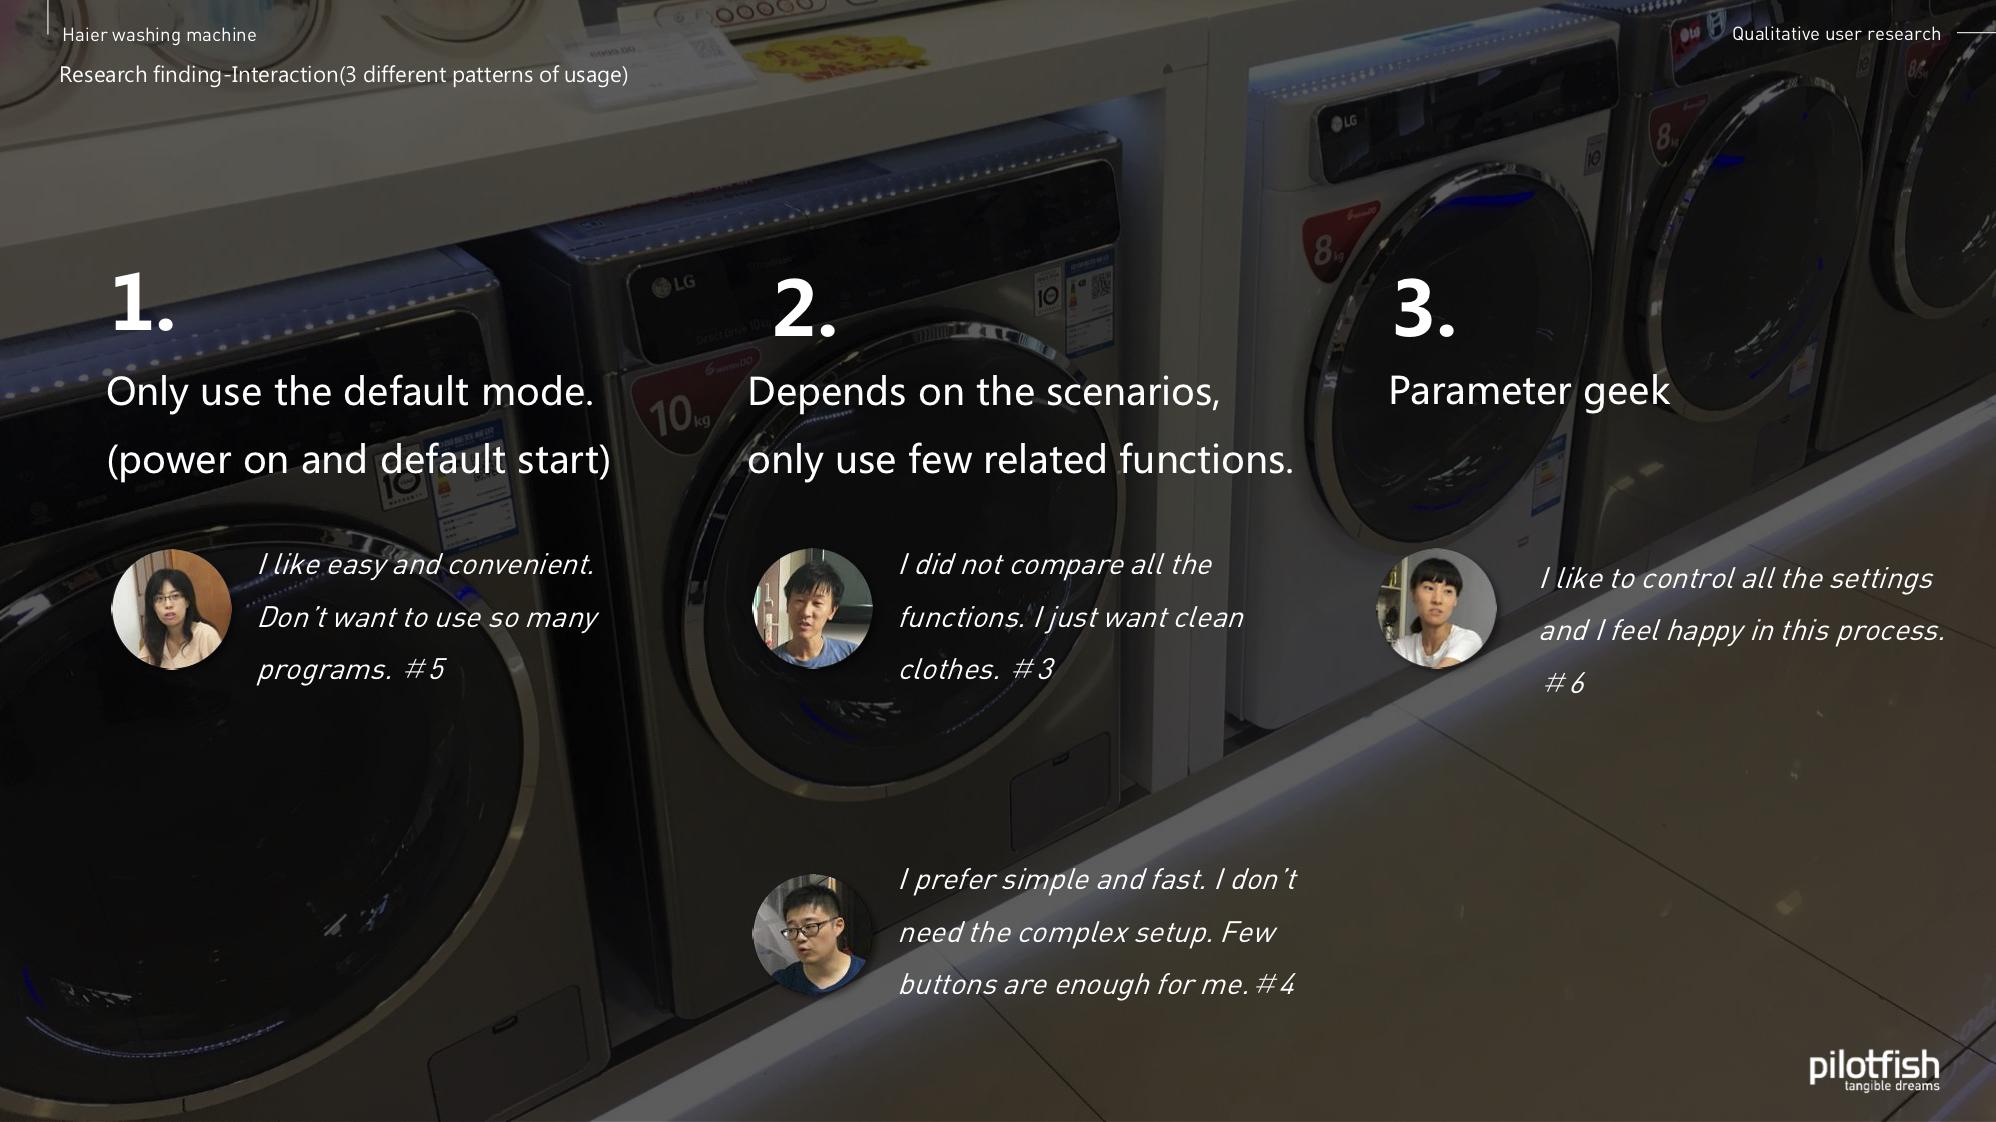 20170727_Haier_washing machine innovative UI_P0 presentation_V4_Eng_28.jpg